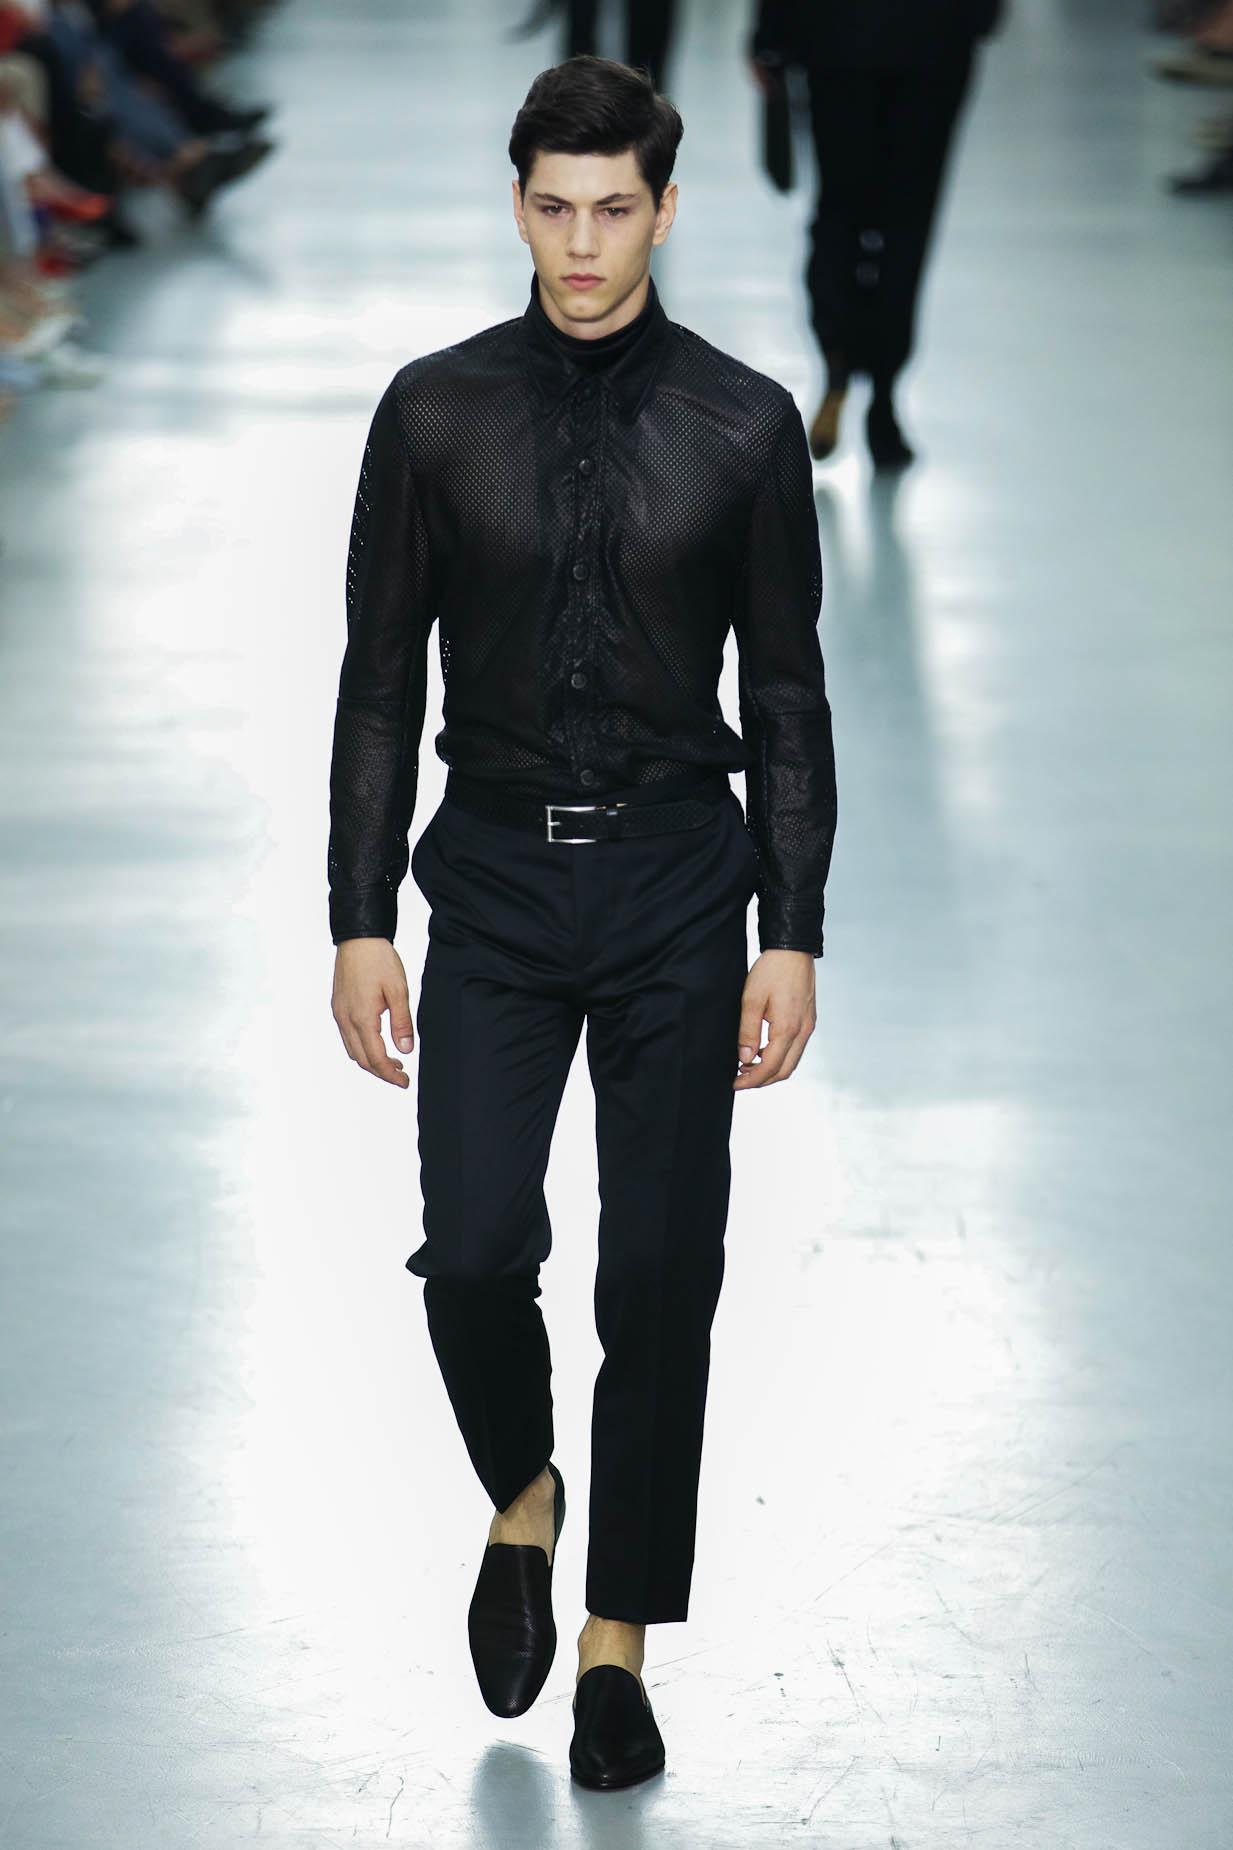 Corneliani Spring Summer 2013 Menswear Collection - Milano Fashion Week